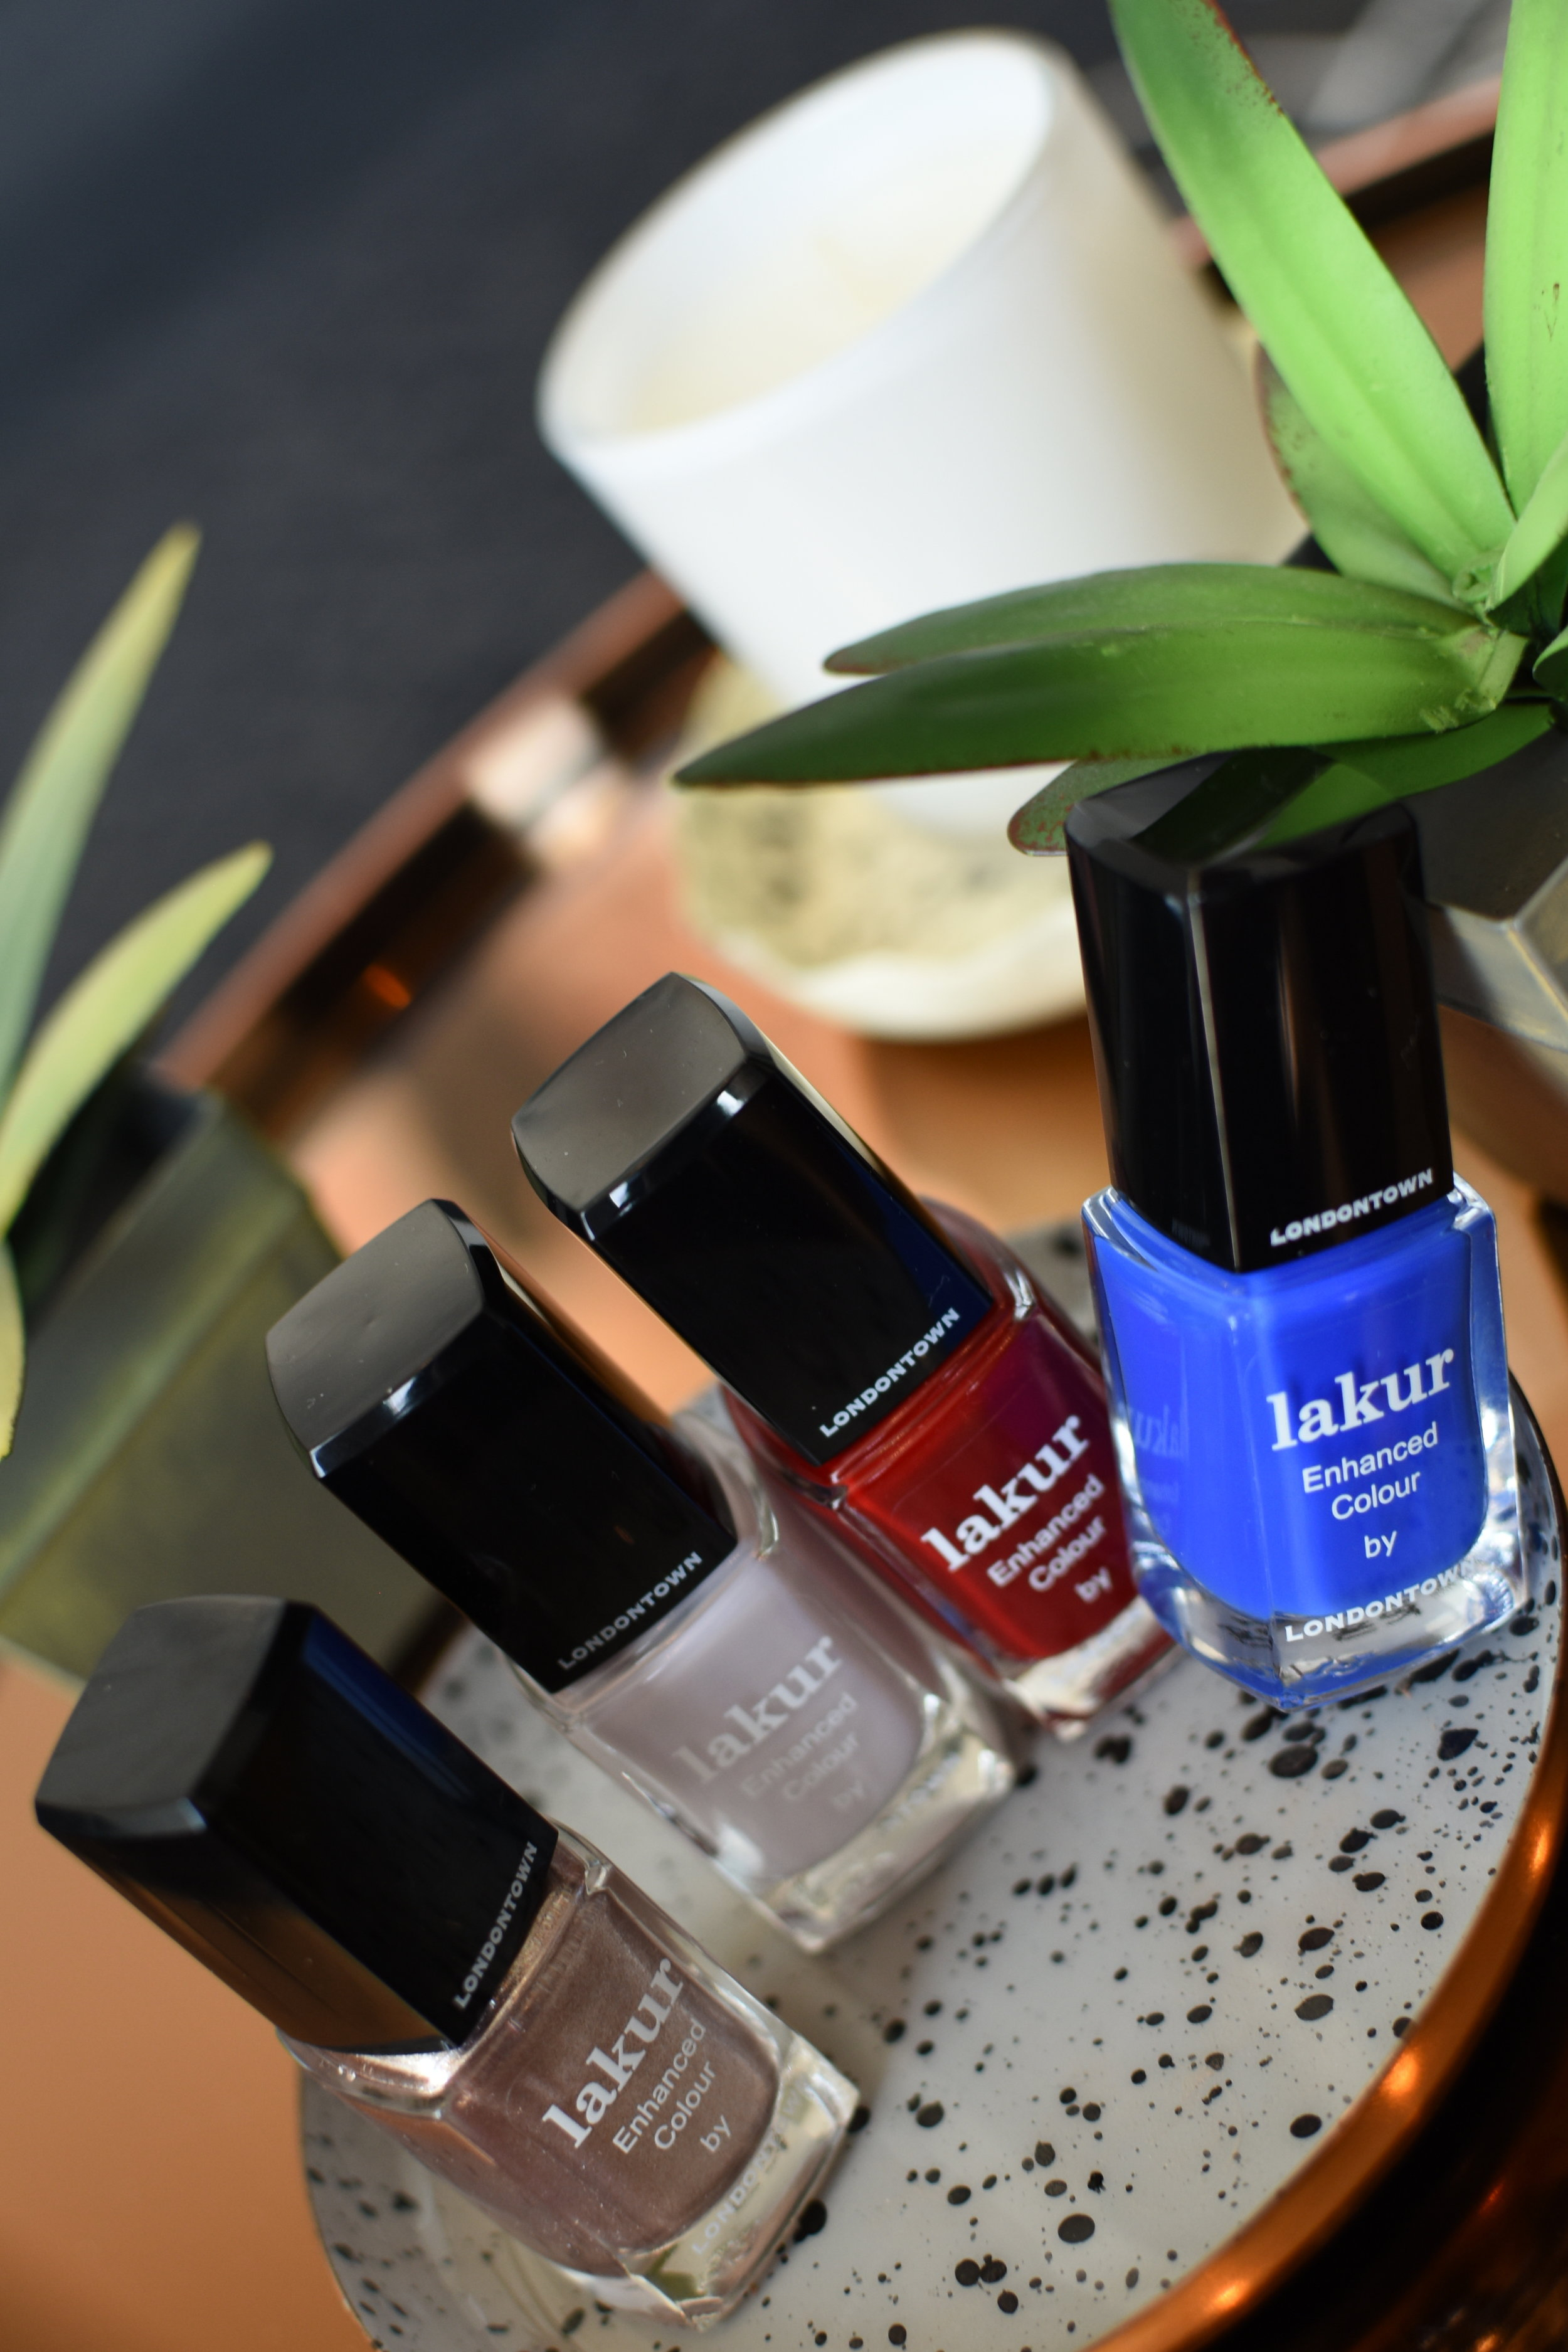 LAKUR, Nail Polish, Londontown, Enhanced Colour, Nail Care, Luxurious Nail Polish, Luxury Nail Care, Luxury Style, Self-pampering